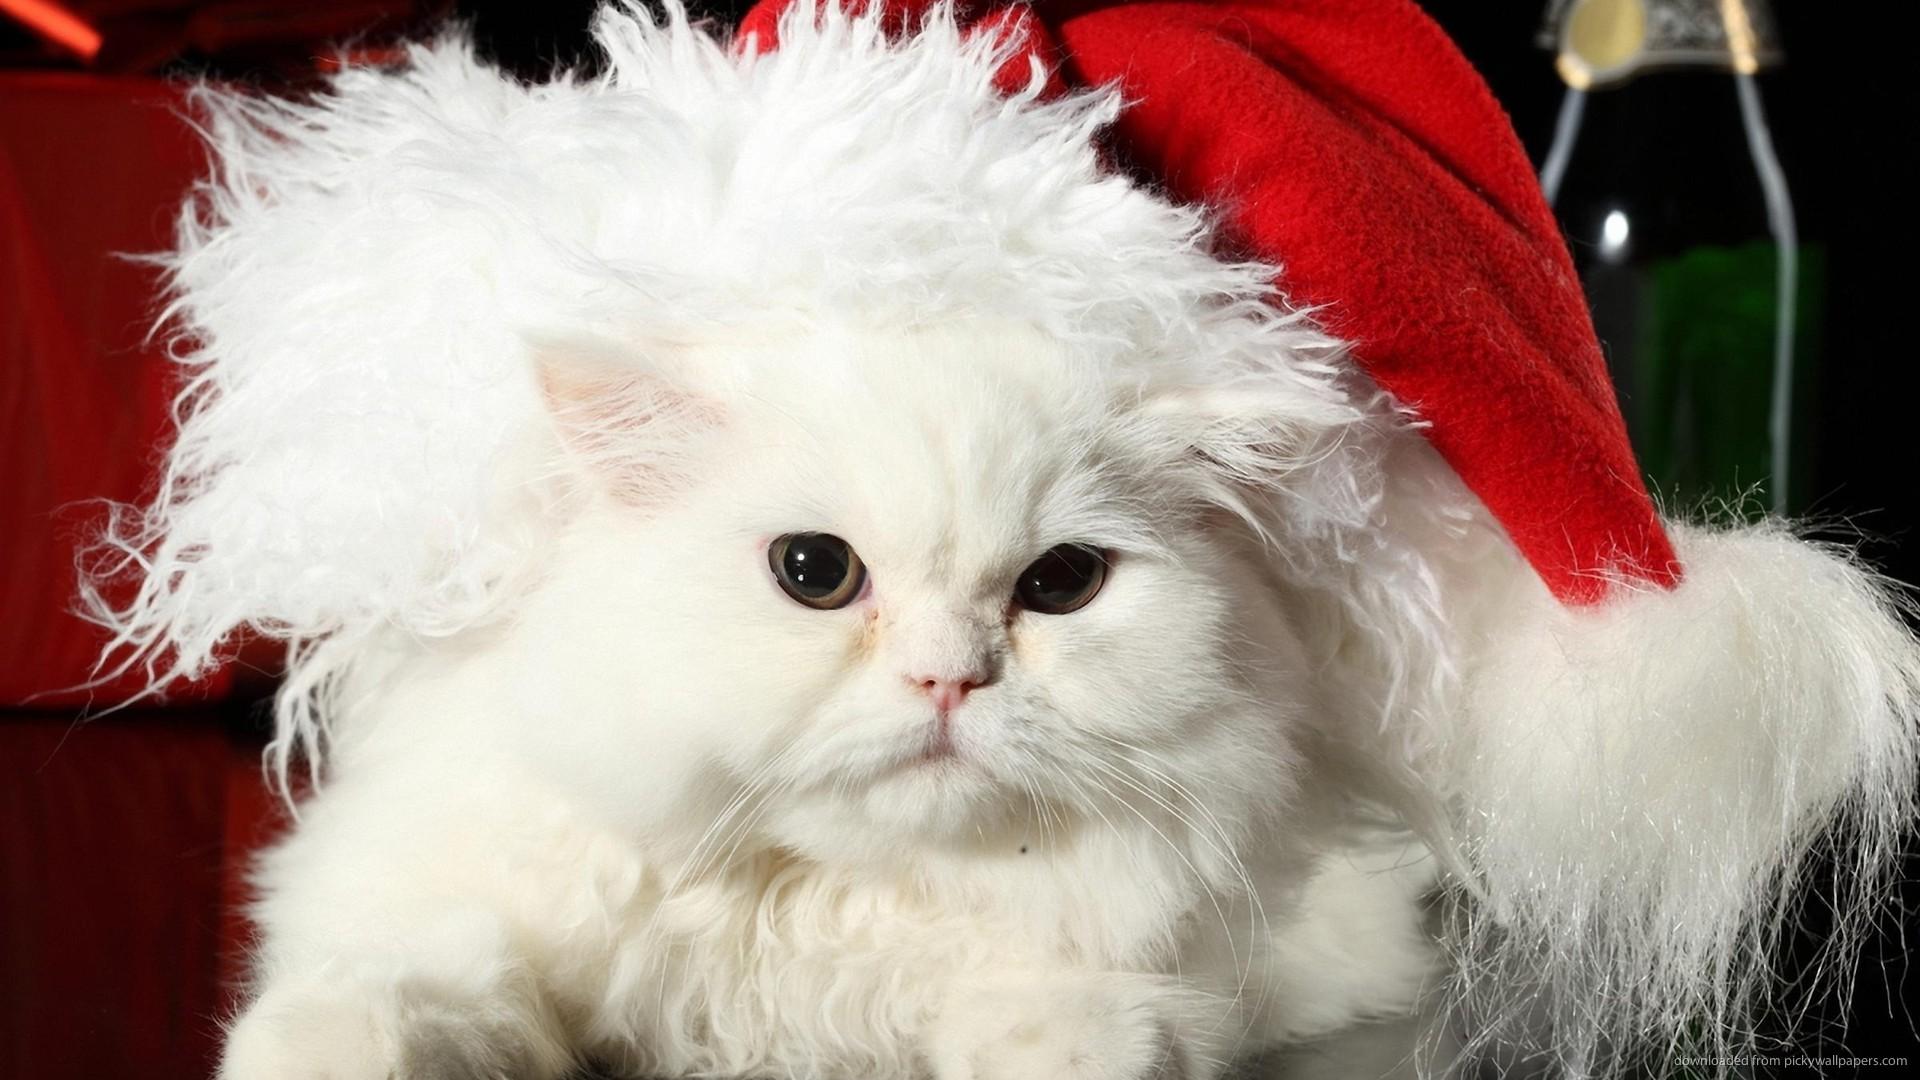 christmas wallpaper holidays cat white 1920x1080 1920x1080